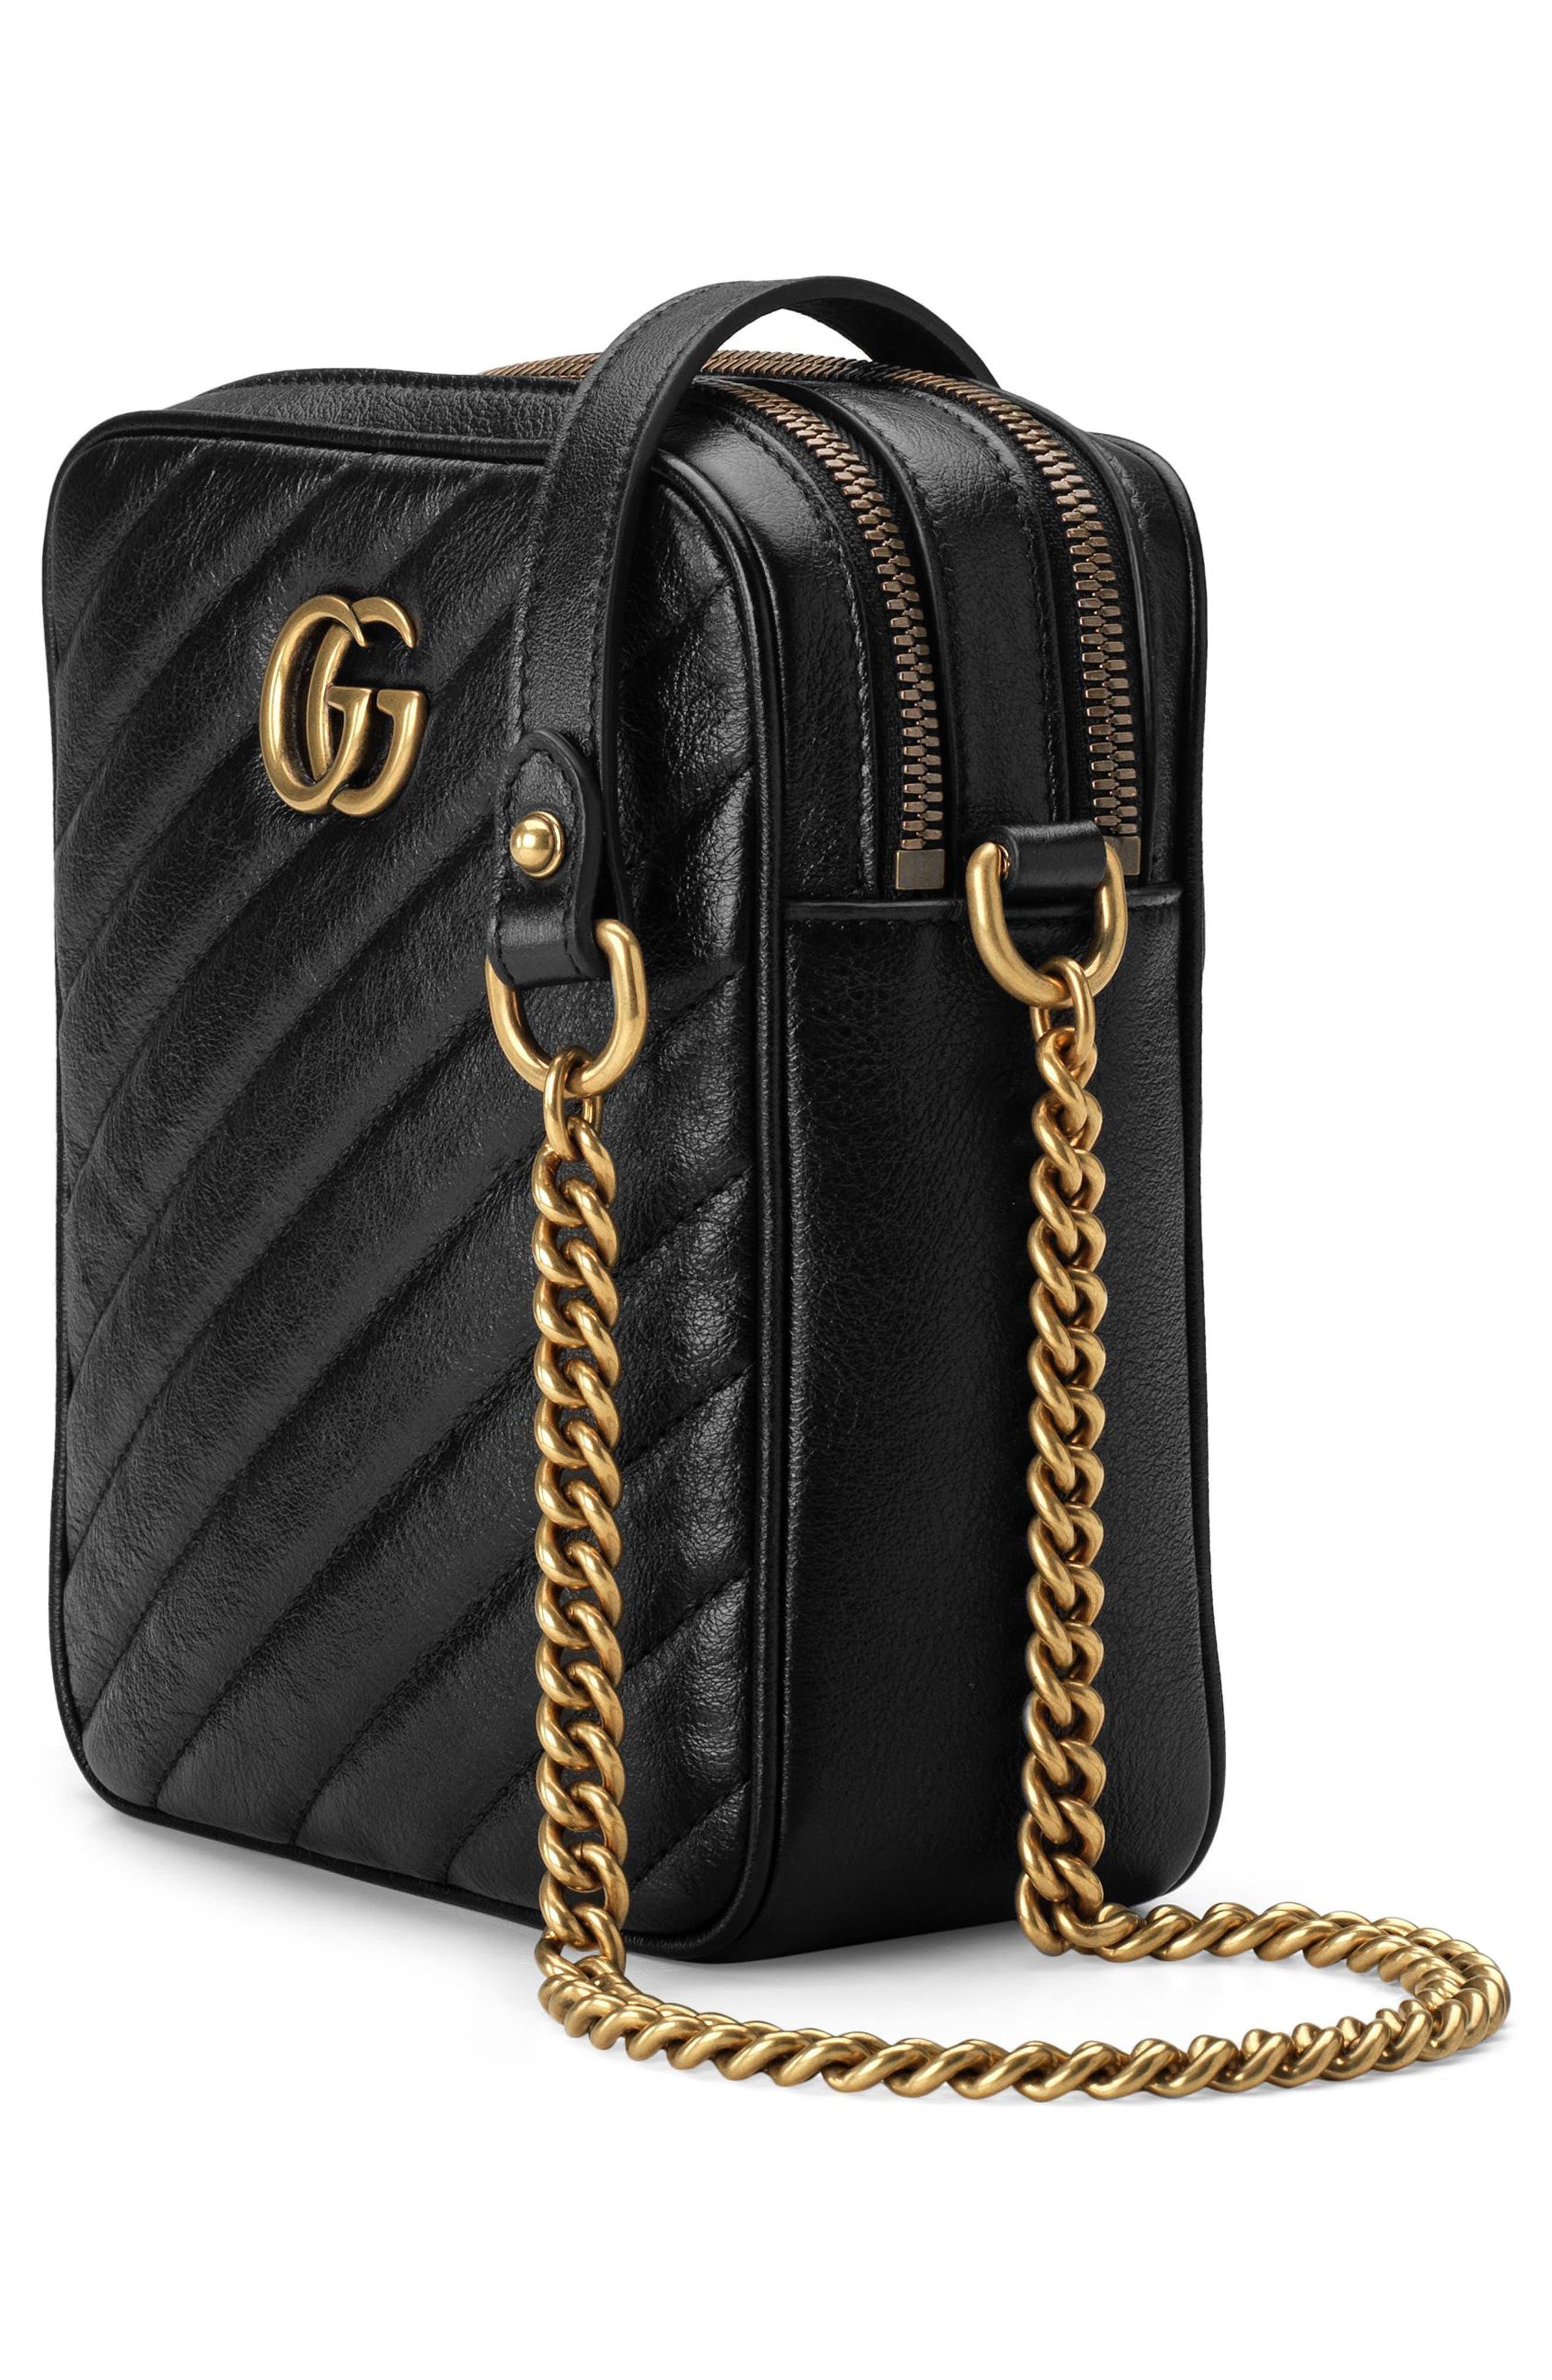 Mini Marmont 2.0 Leather Crossbody Bag,                             Alternate thumbnail 4, color,                             NERO